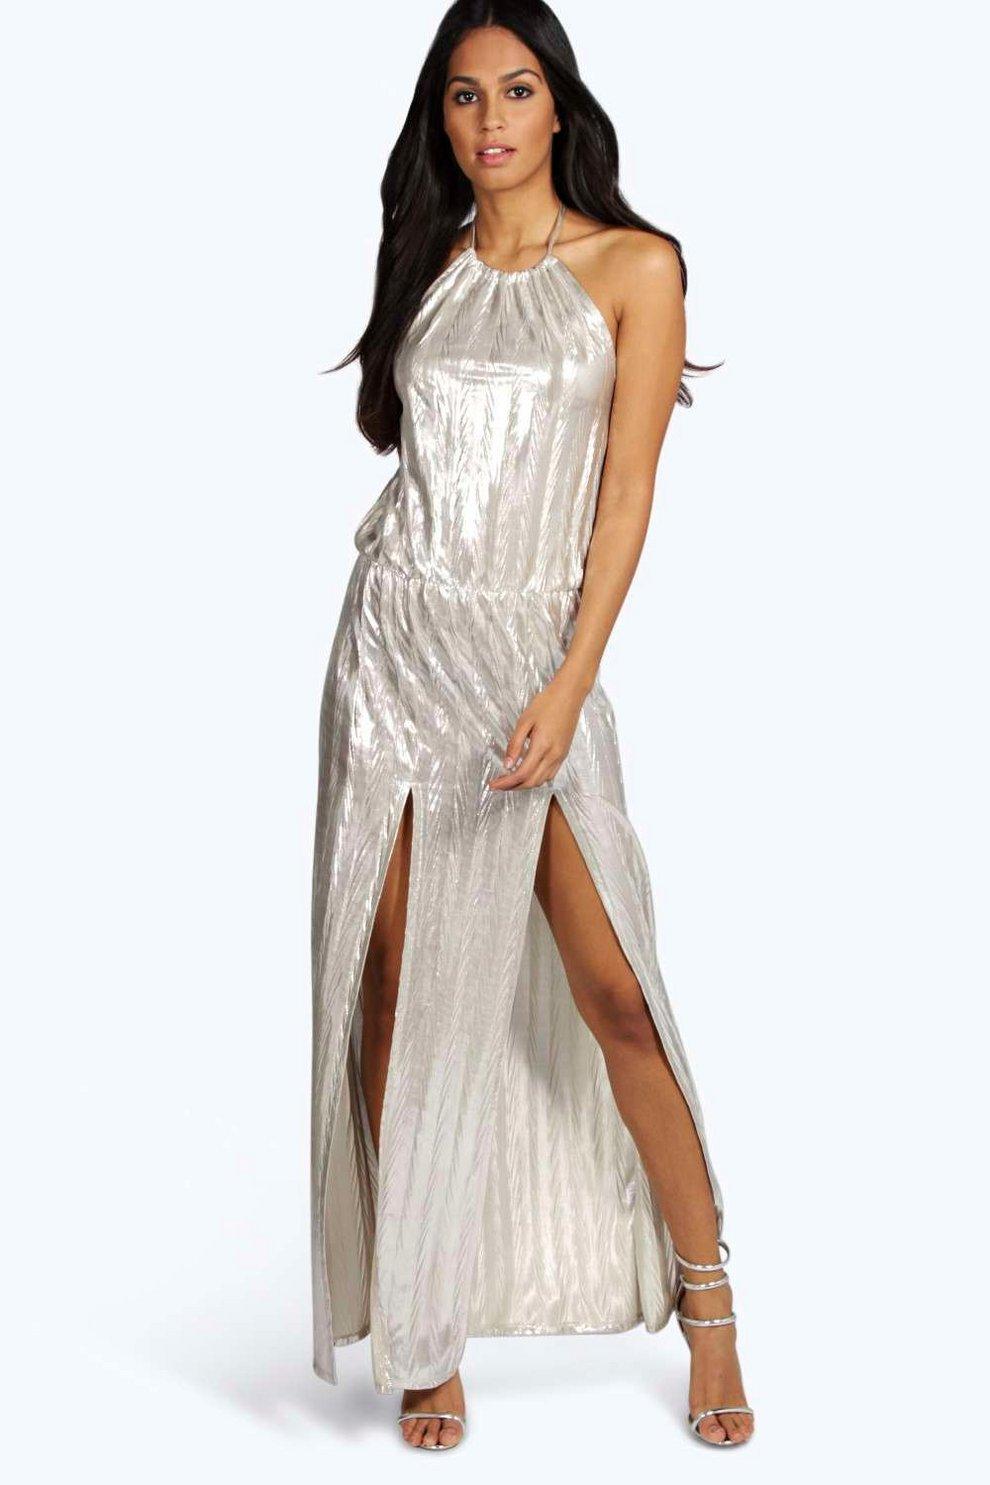 67c0ee344d9c ... Floral Cold Shoulder Maxi Dress; 4aa37d53a8 Rosie Metallic Pleated  Halter Maxi Dress ...